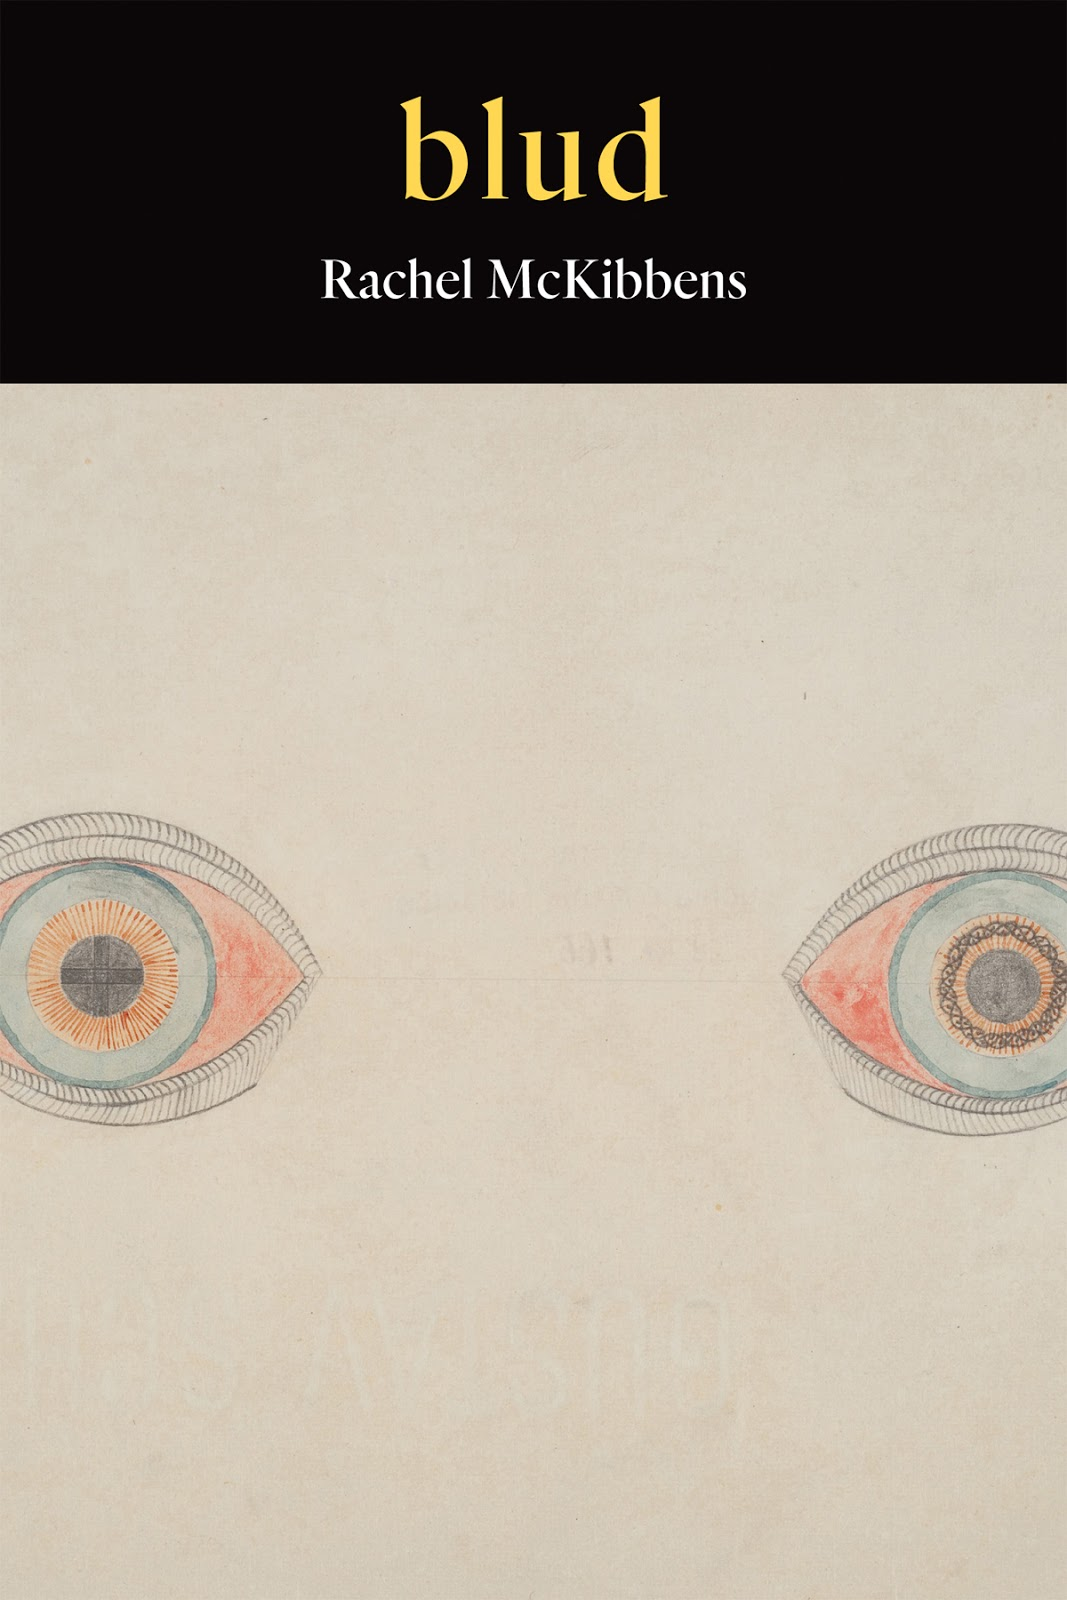 rob mclennan s blog rachel mckibbens blud